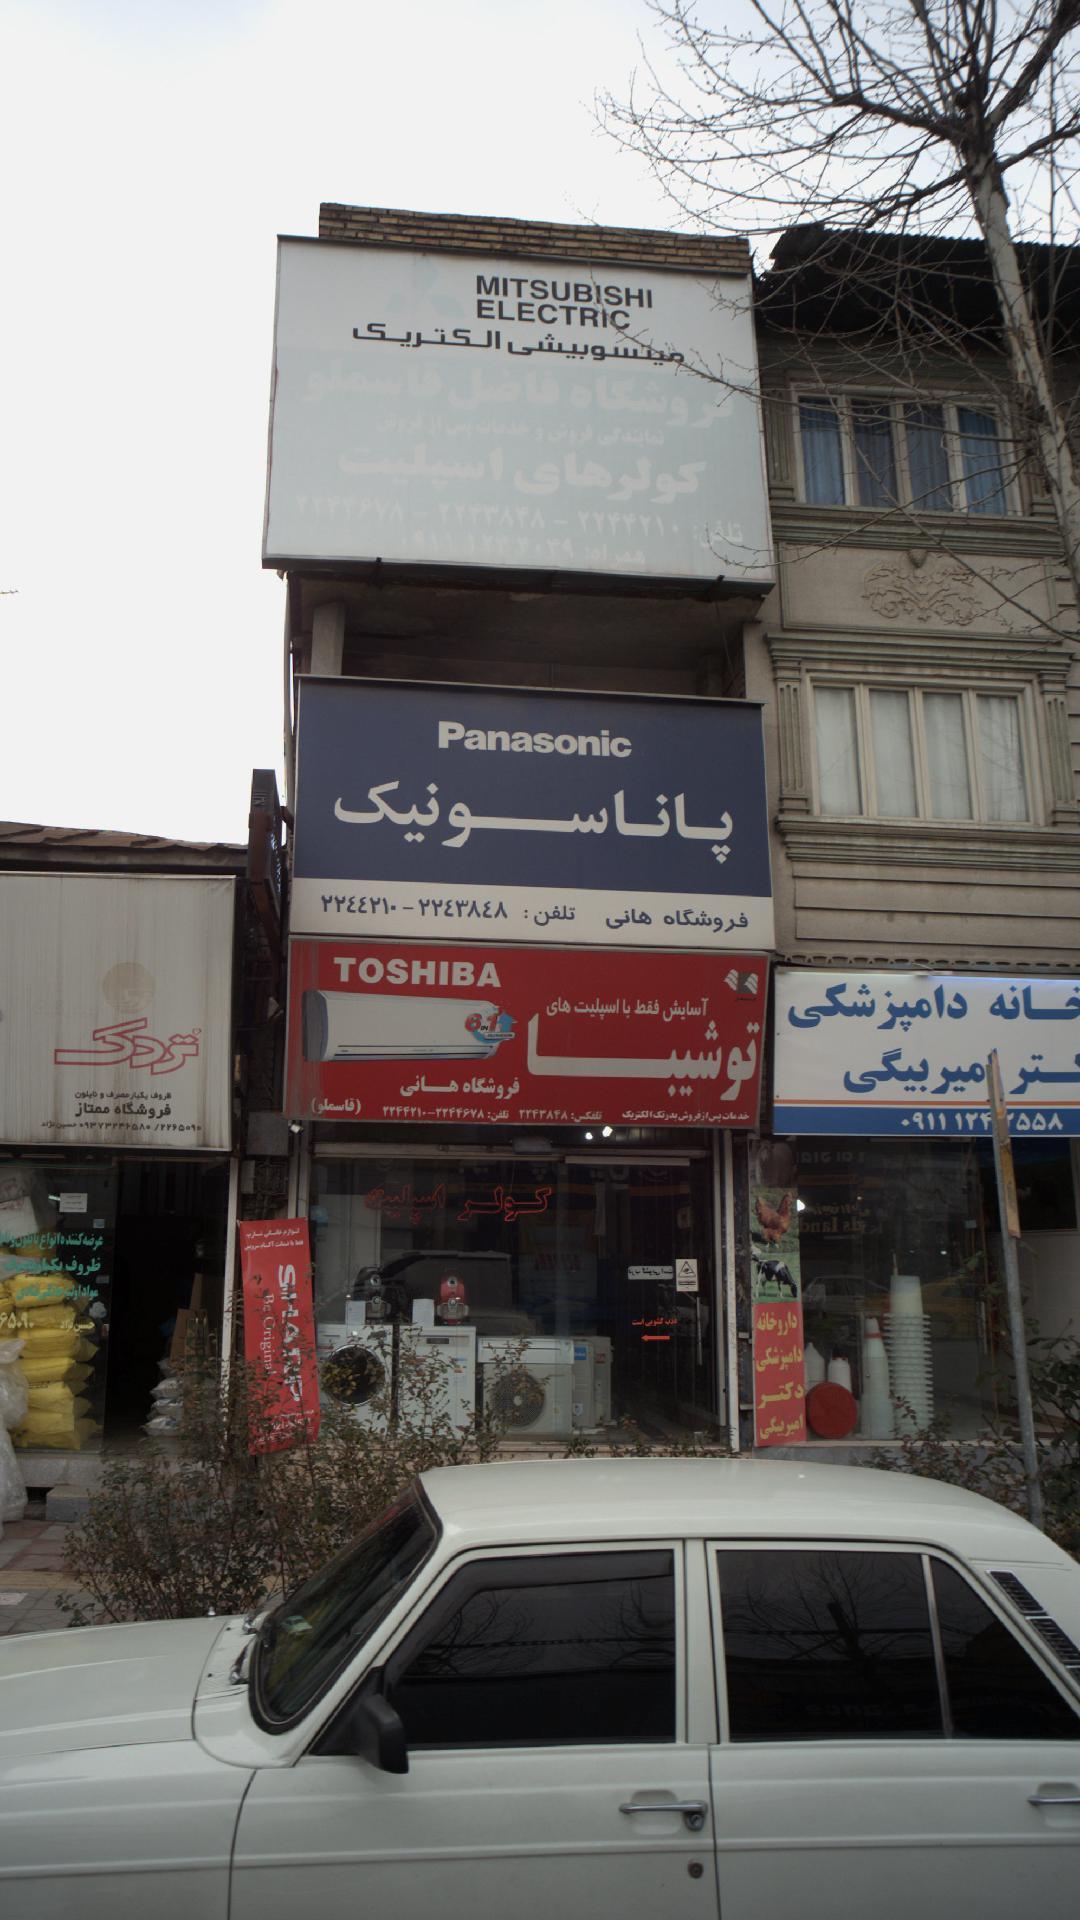 فروشگاه لوازم خانگی فاضل قاسملو